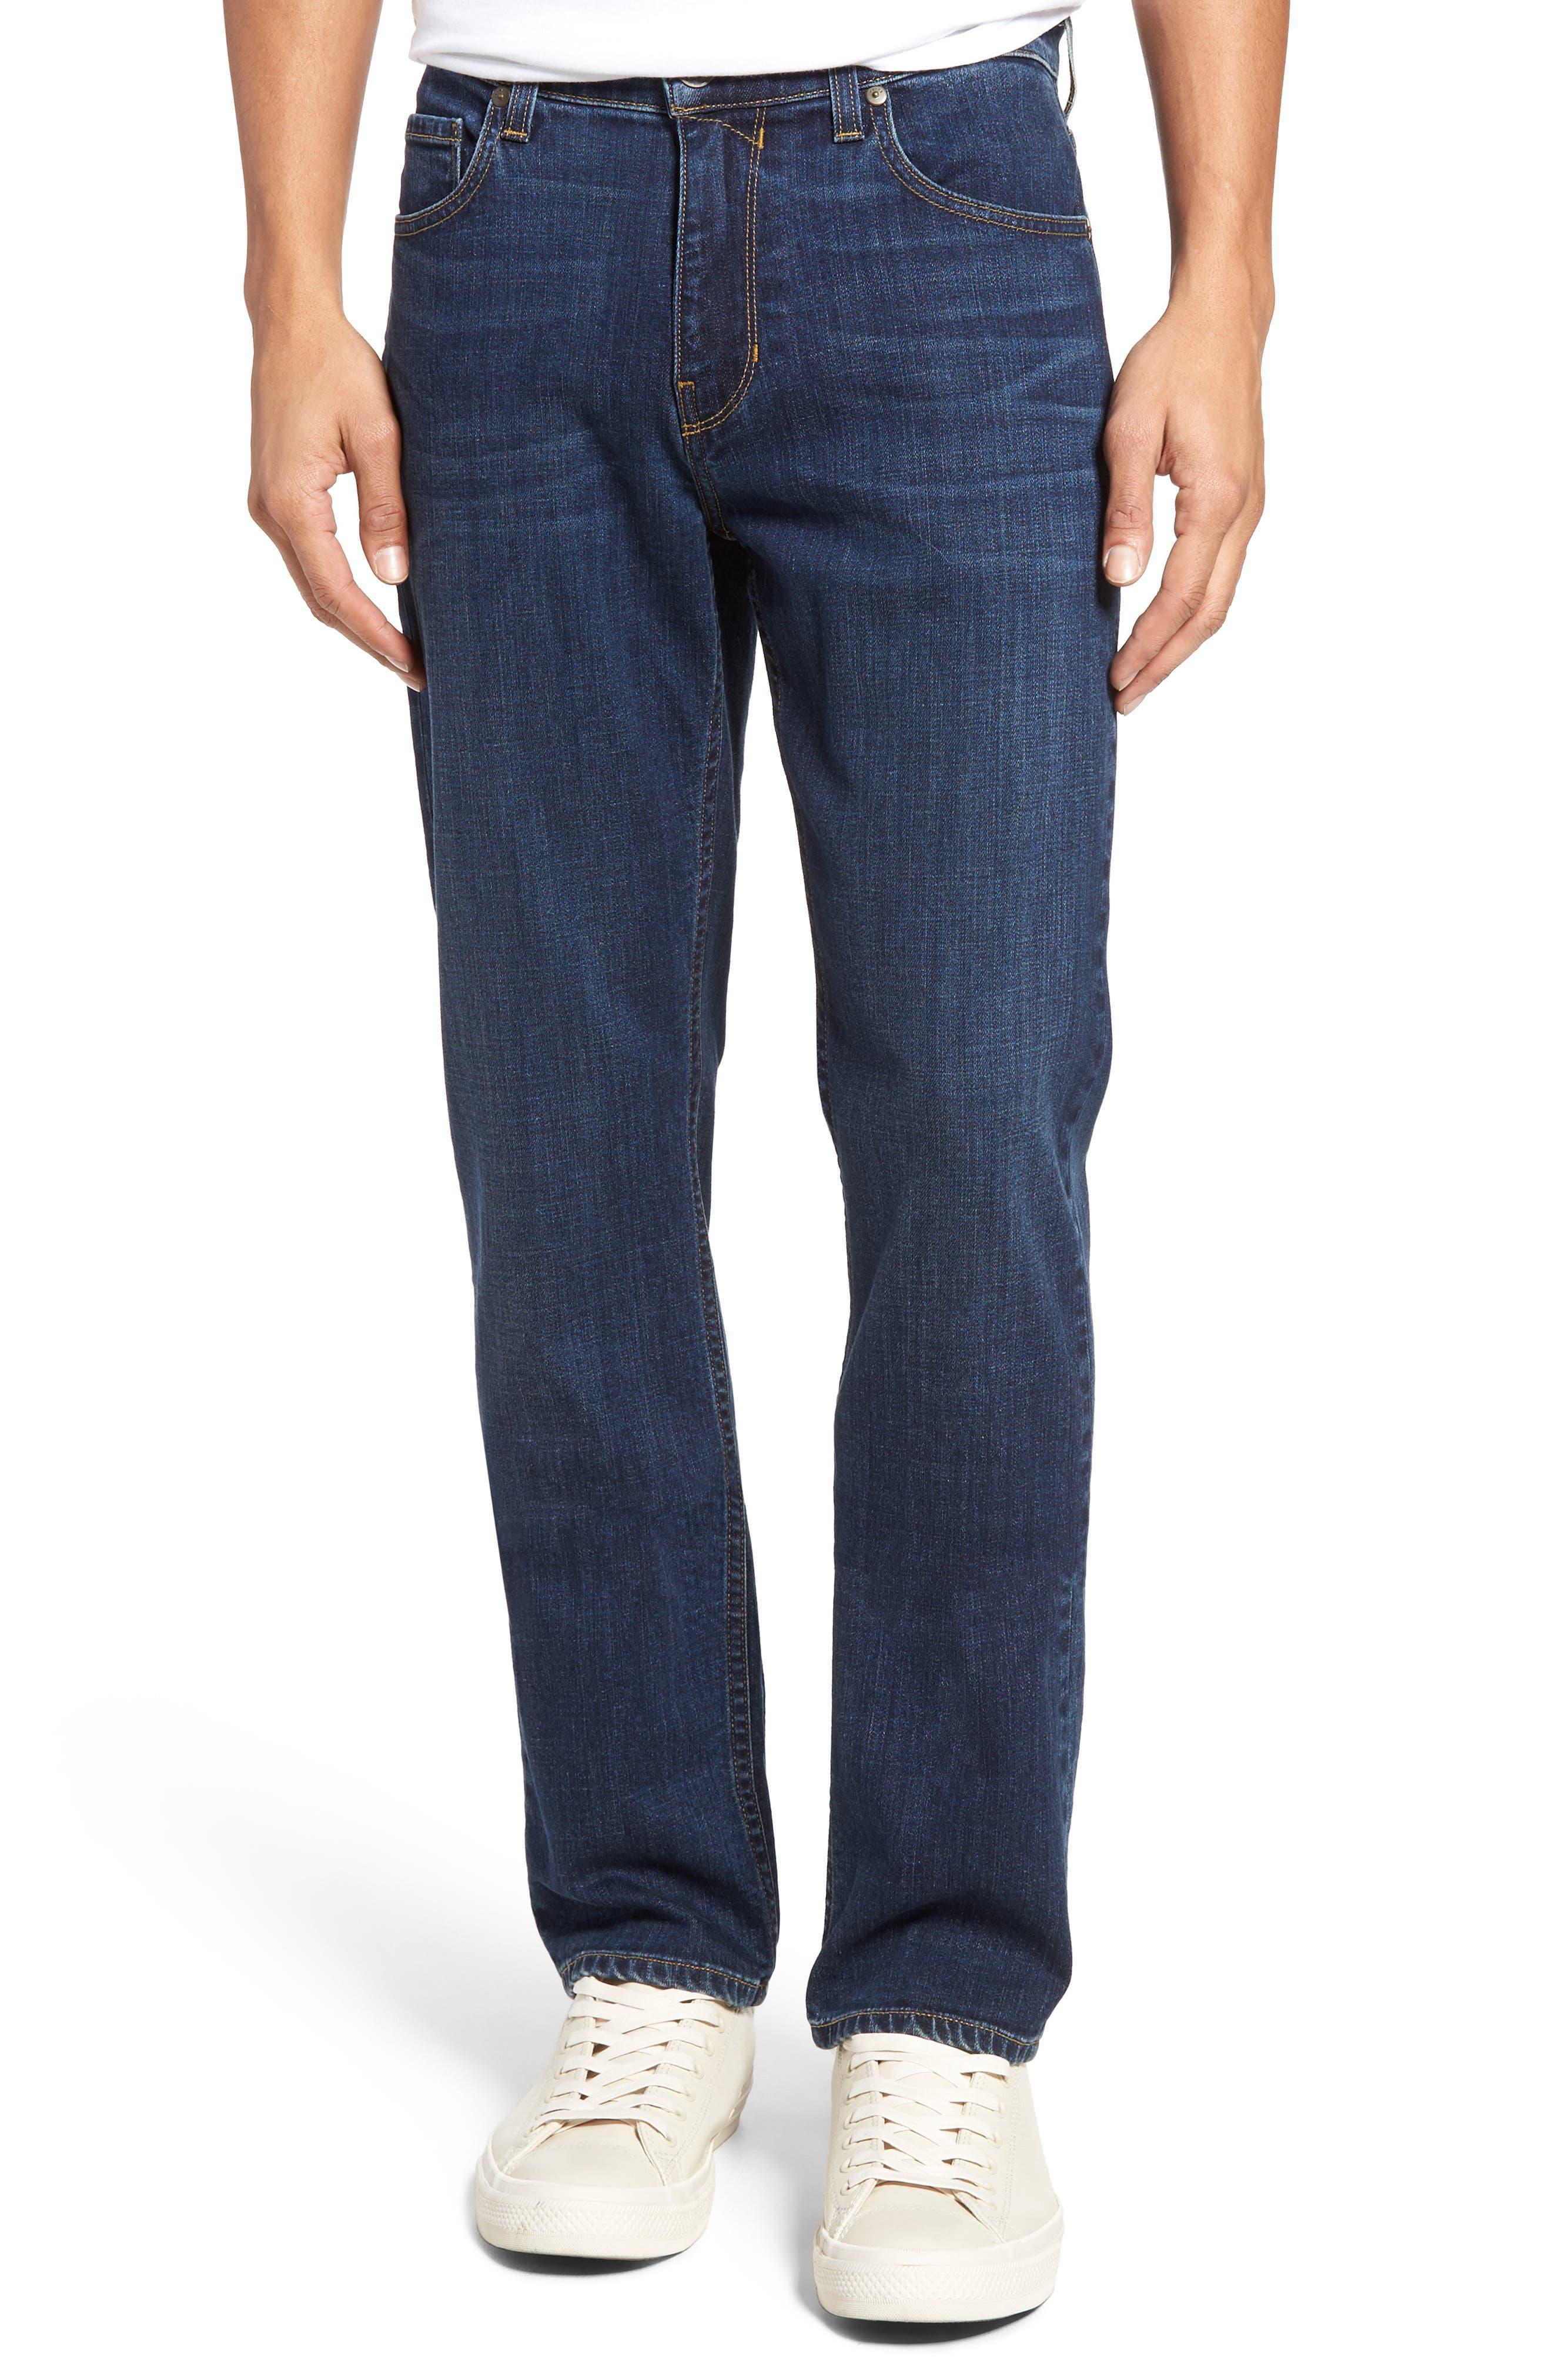 Normandie Straight Leg Jeans,                             Main thumbnail 1, color,                             ANGELO